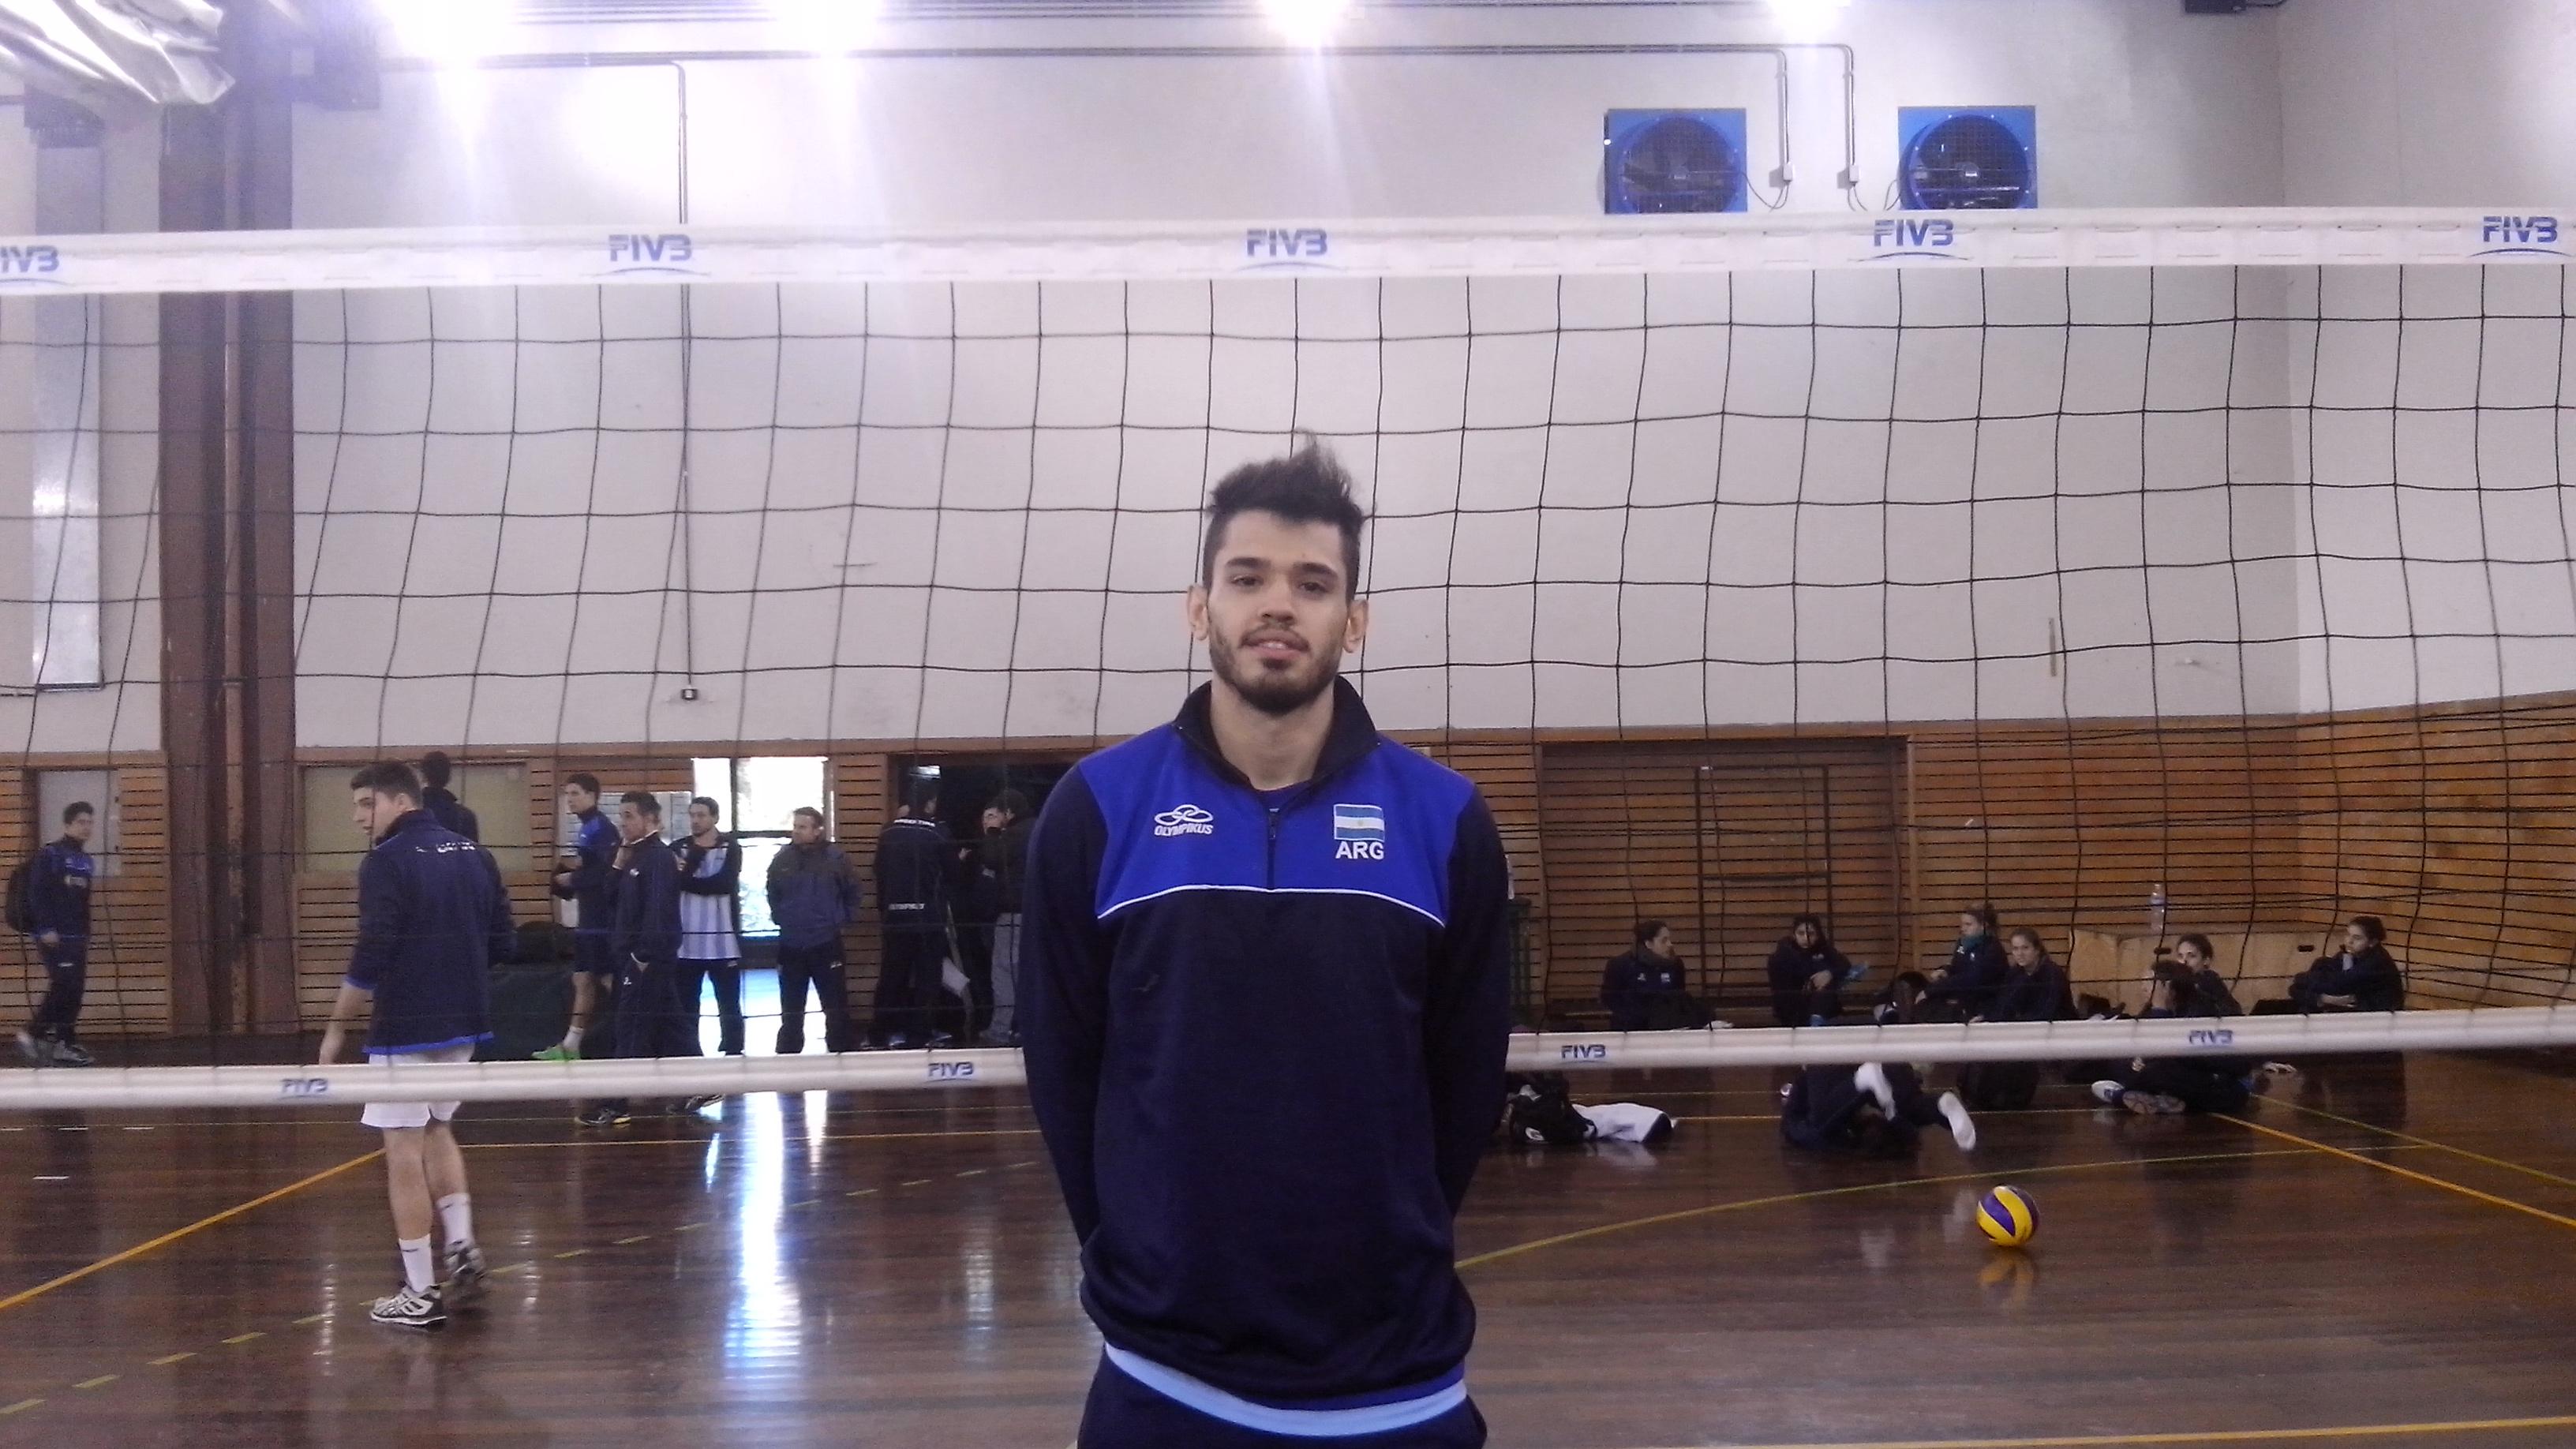 Nicolás Lazo